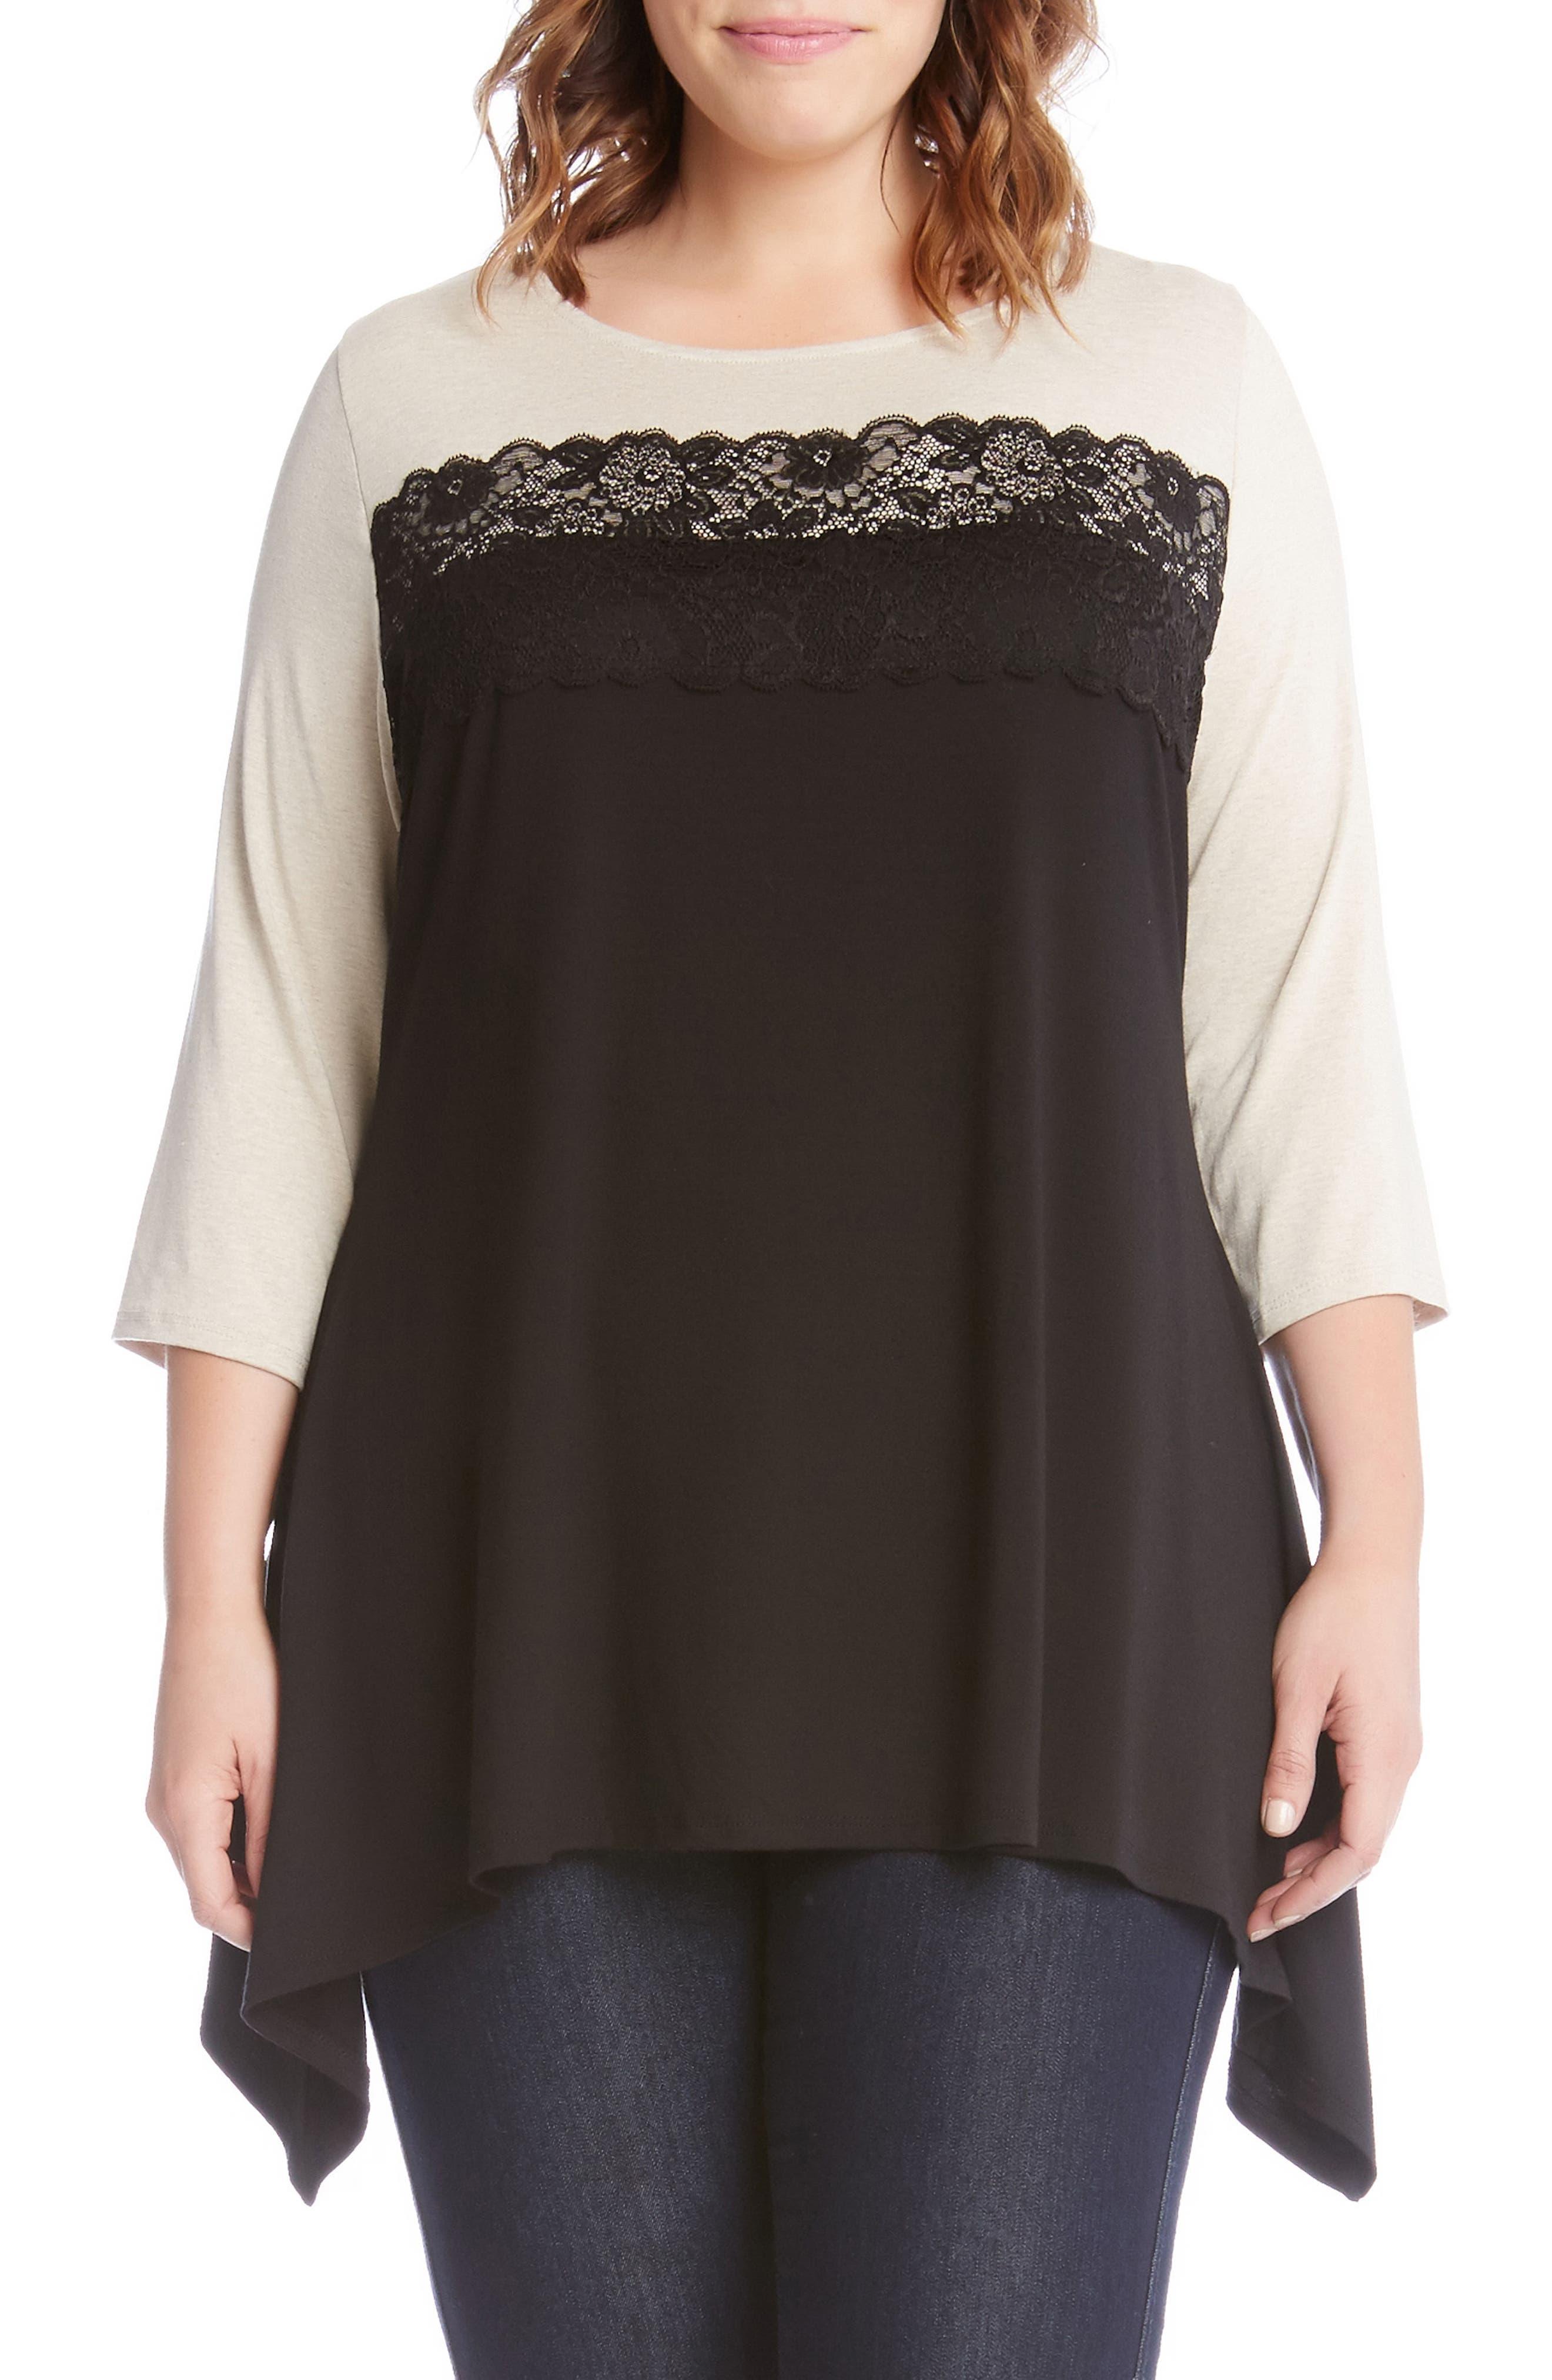 Alternate Image 1 Selected - Karen Kane Lace Trim Handkerchief Hem Top (Plus Size)